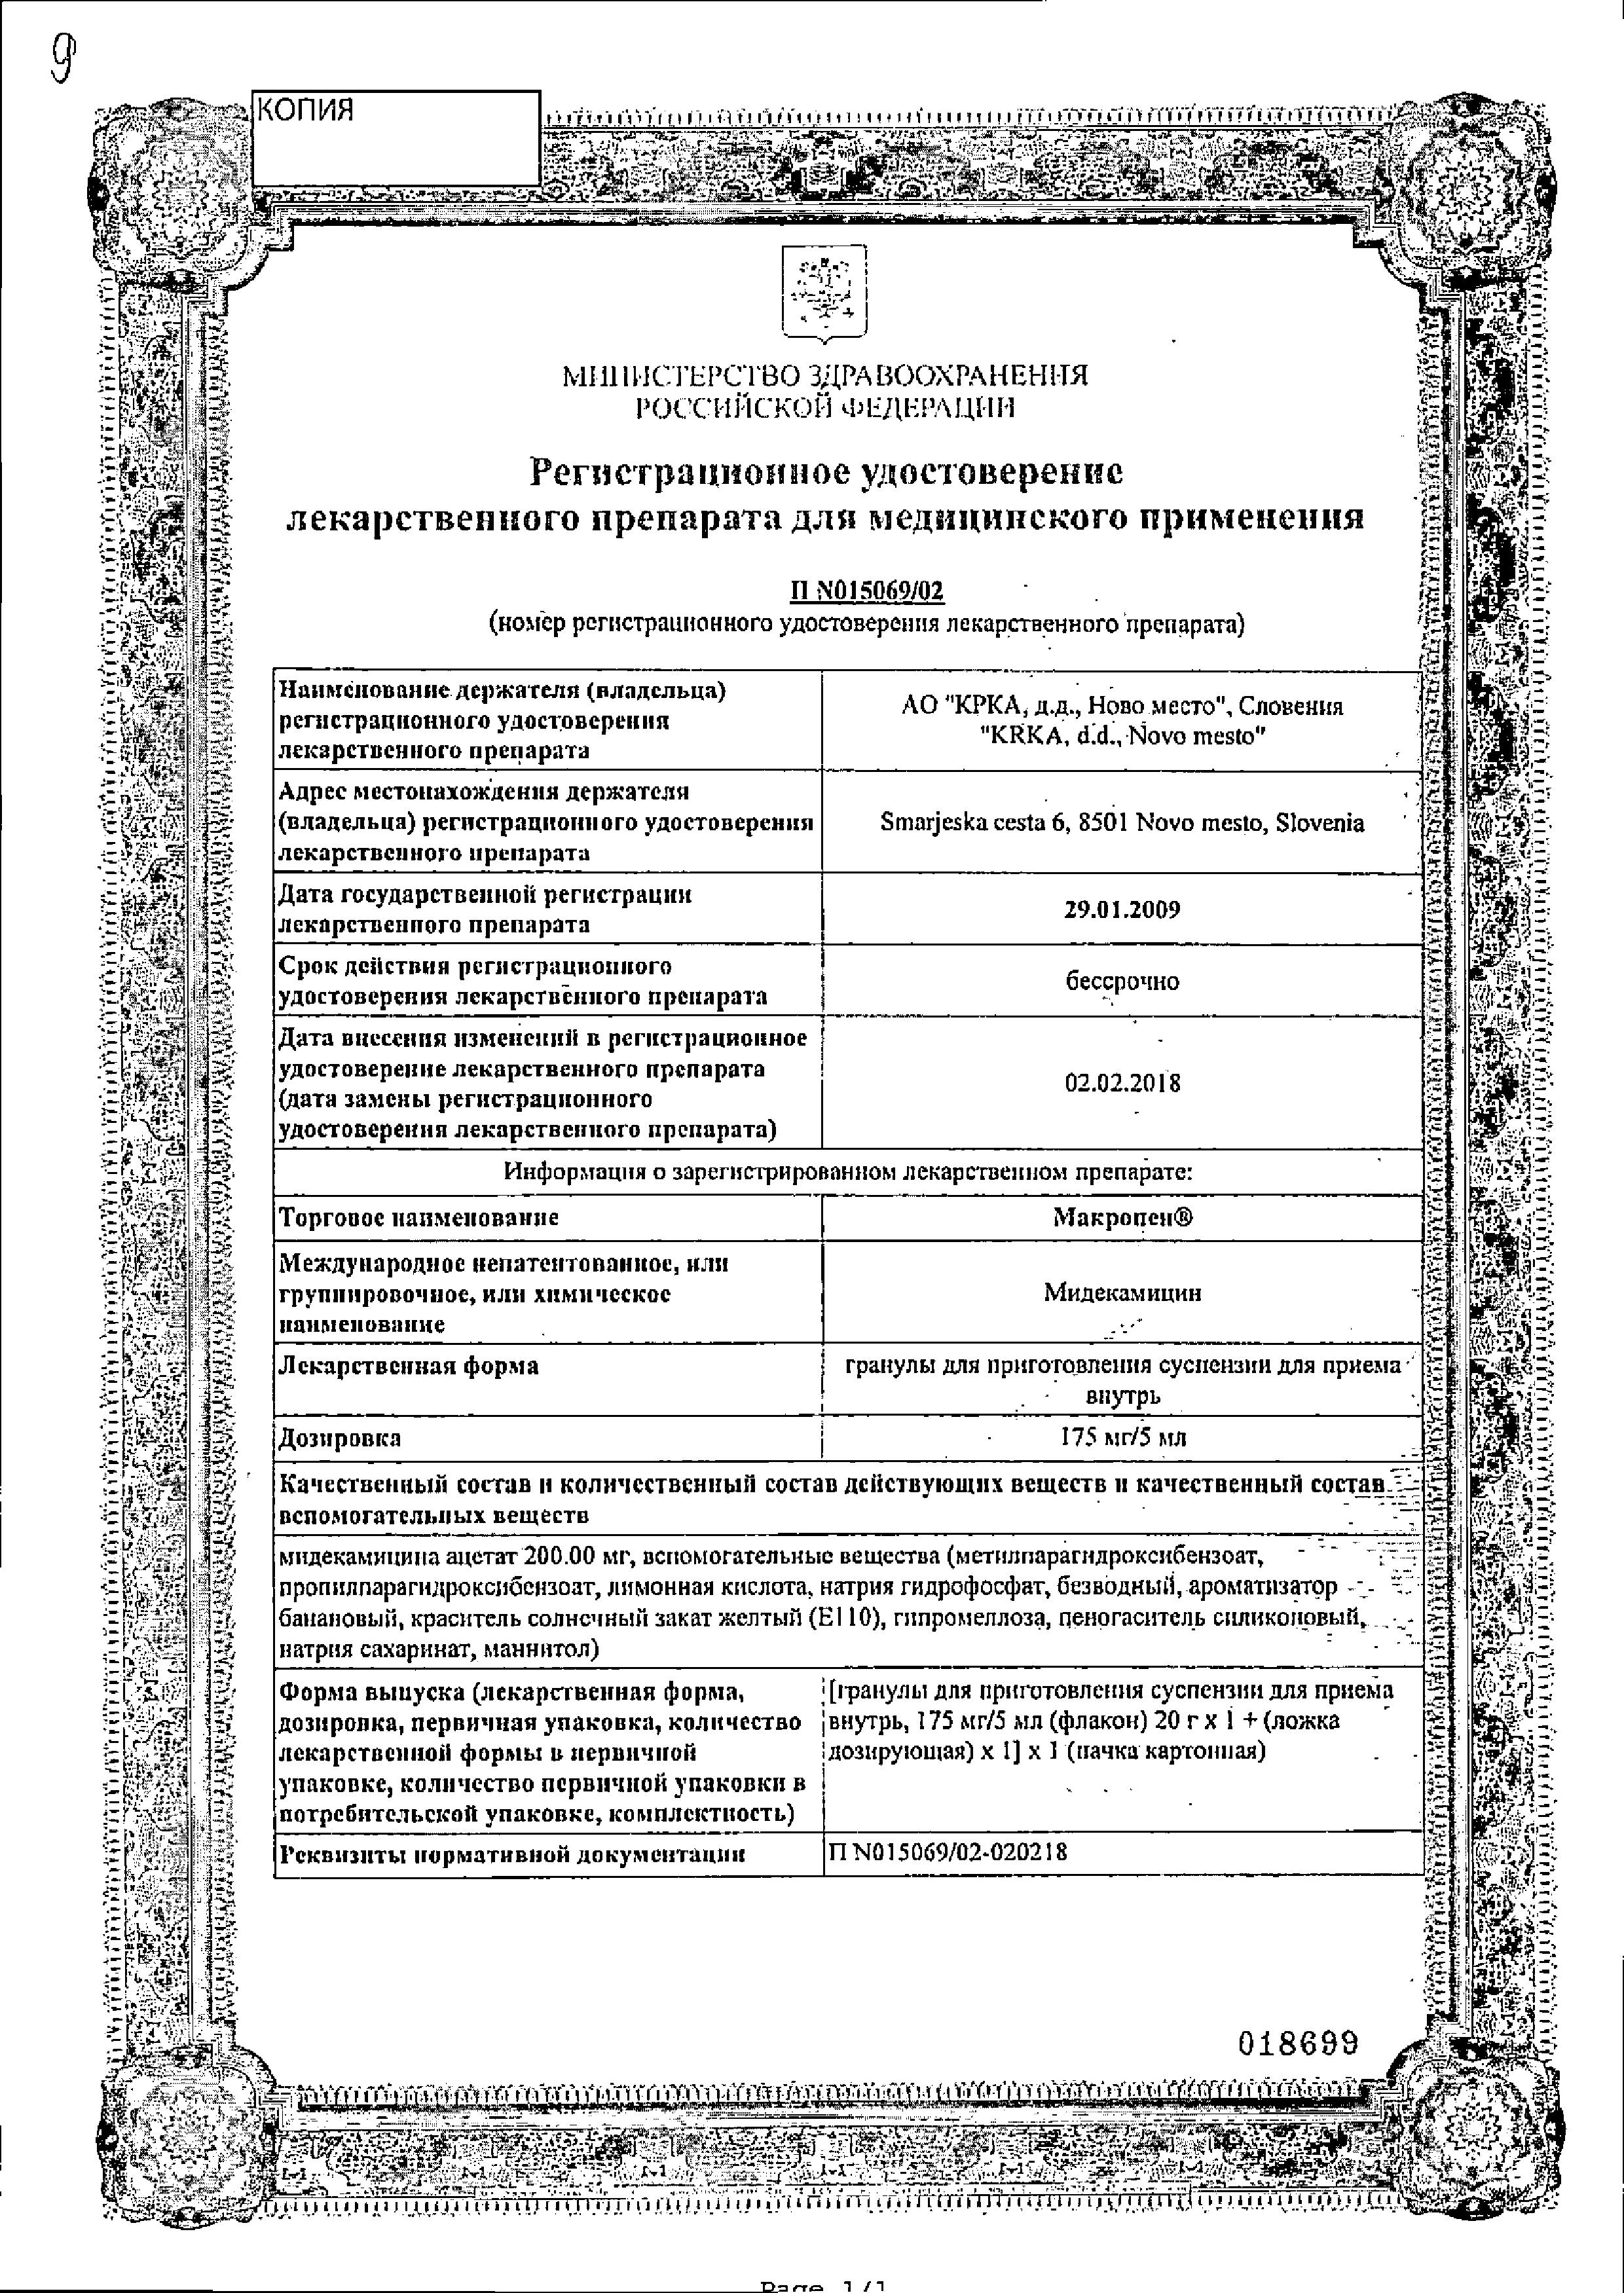 Макропен сертификат